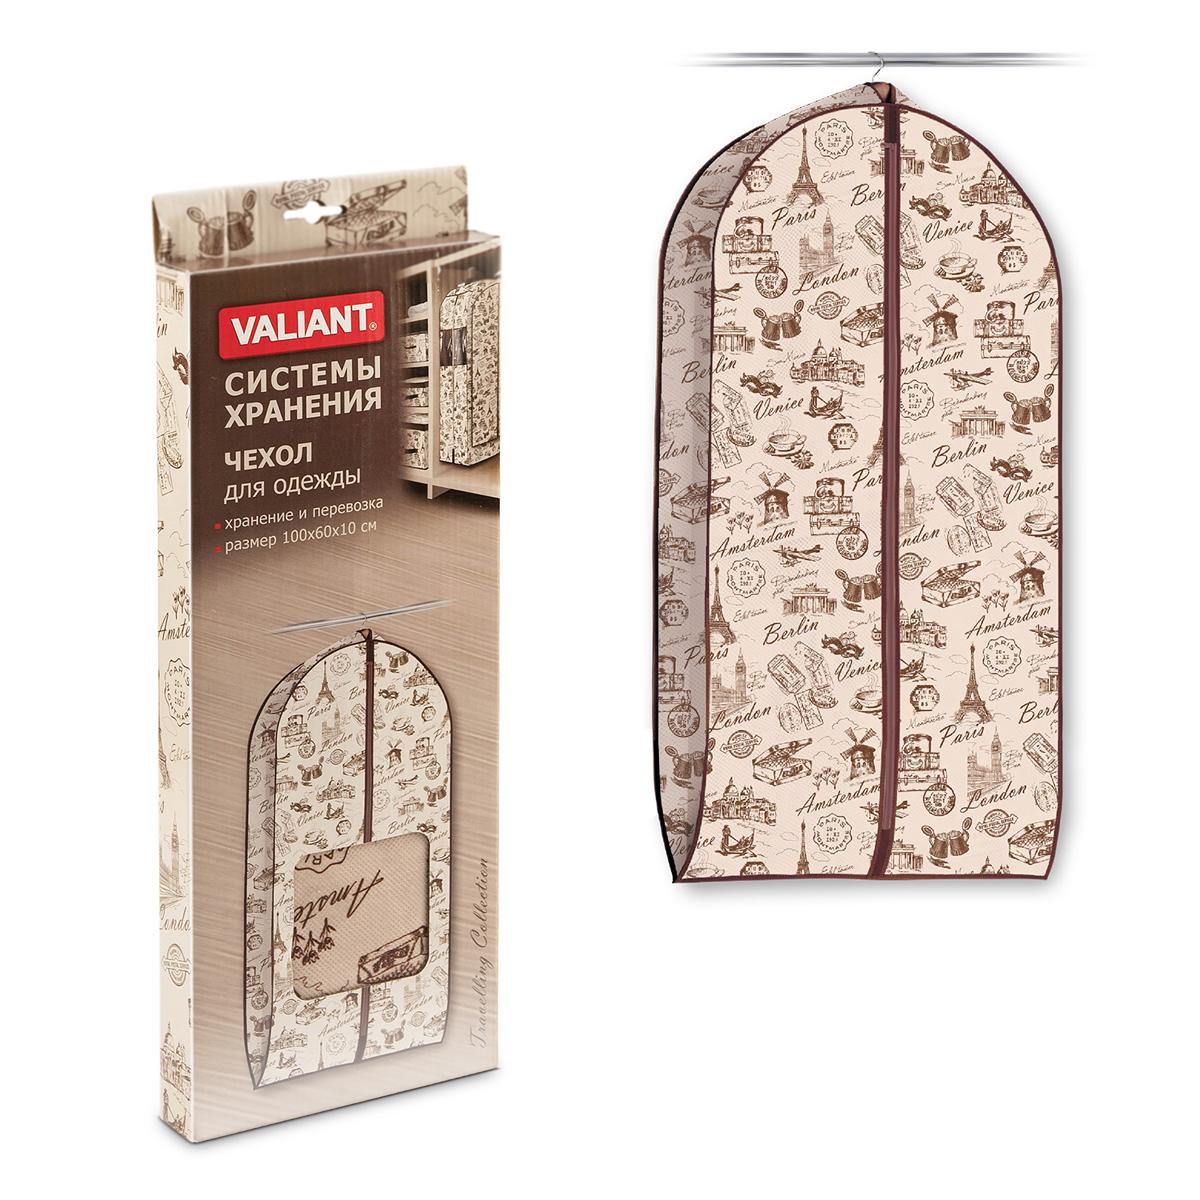 "Чехол для одежды Valiant ""Travelling"", объемный, 60 см х 100 см х 10 см TR-106H"